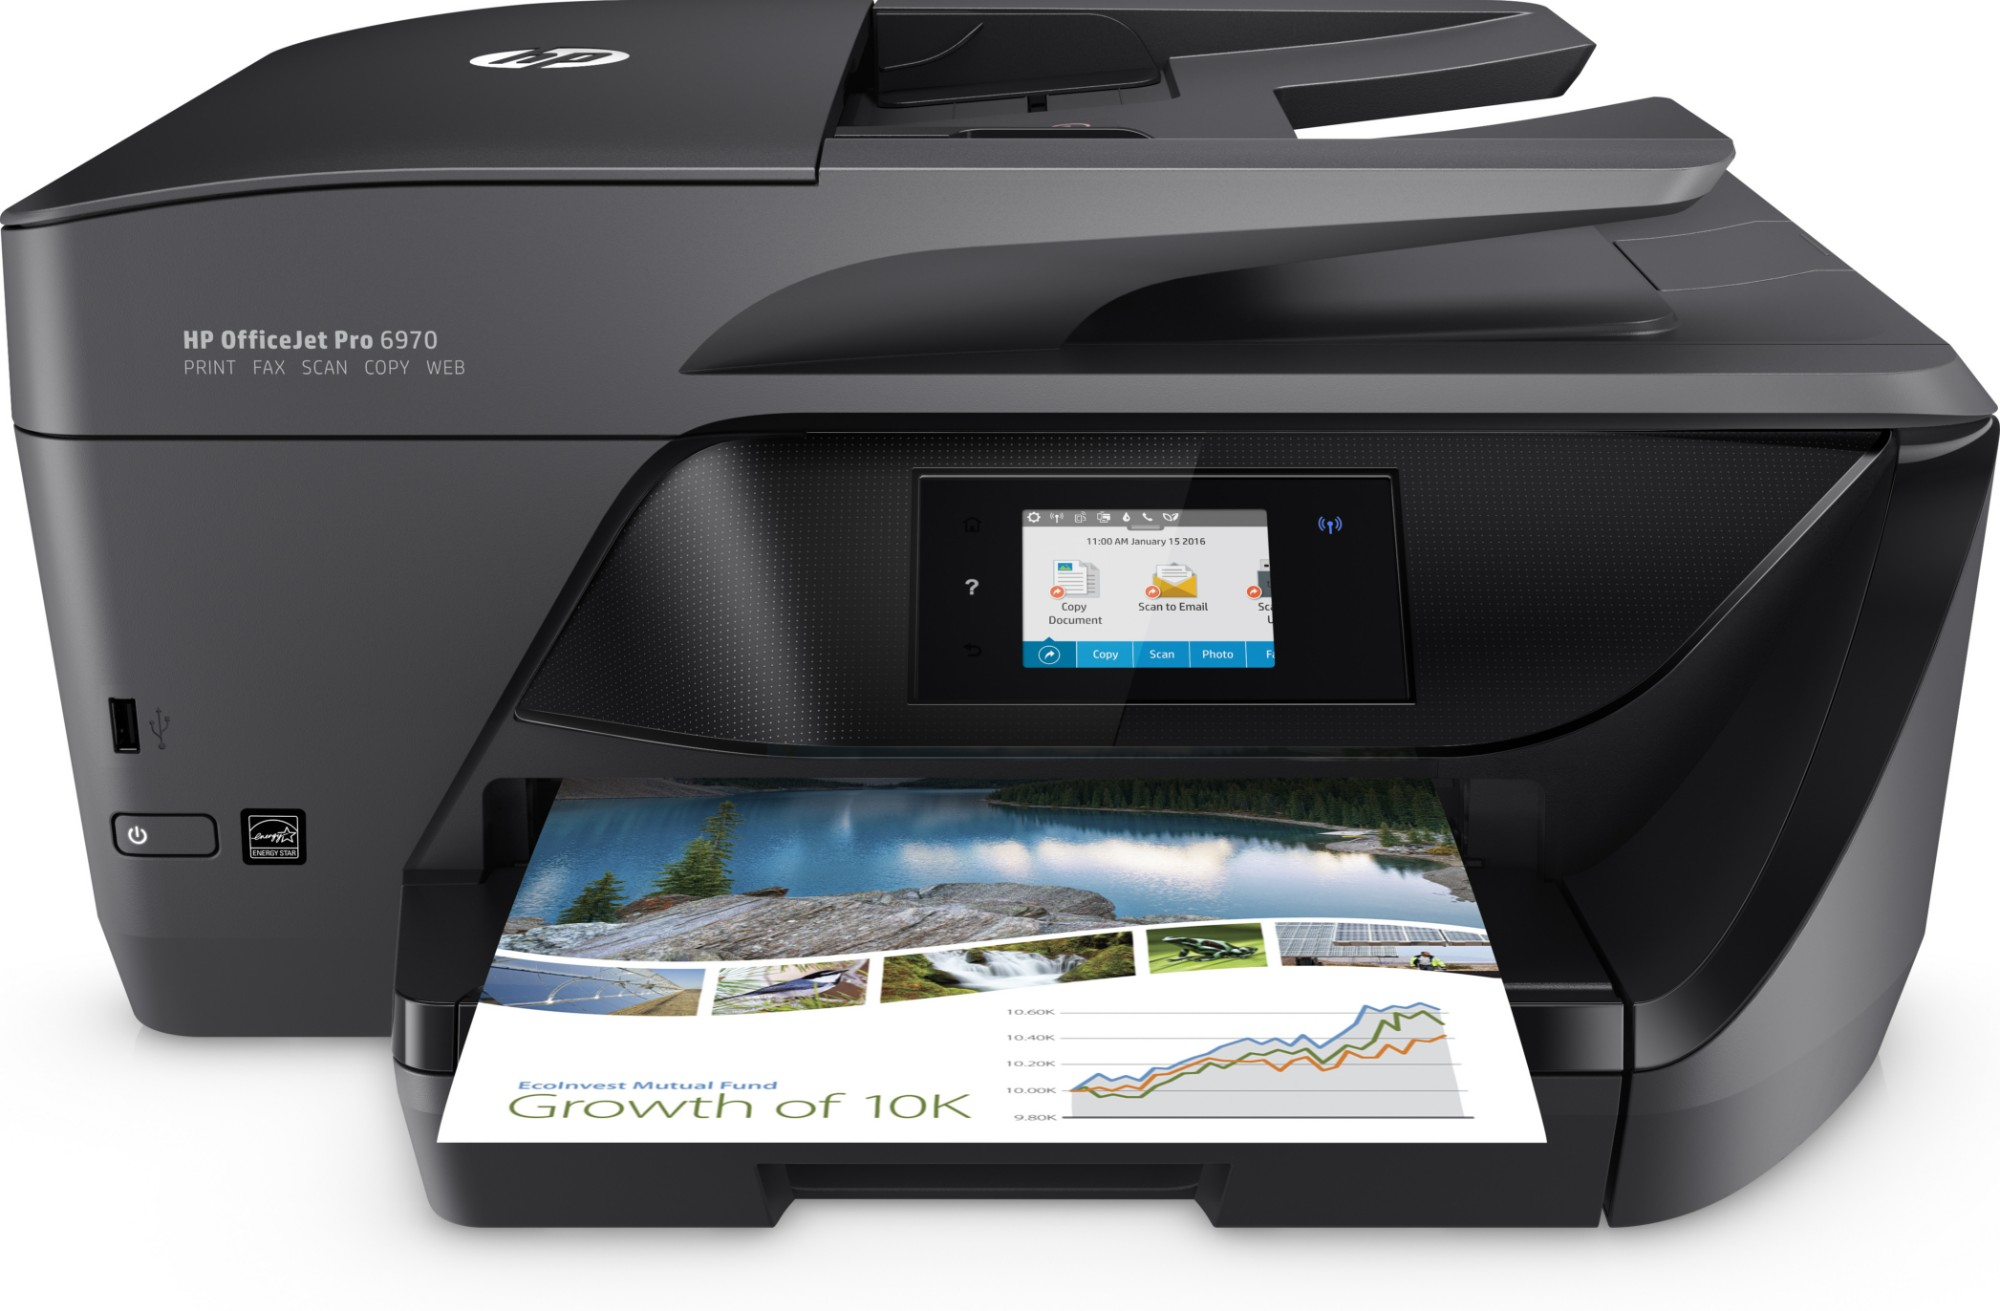 HP OfficeJet Pro 6970 AiO 600 x 1200DPI Thermal Inkjet A4 20ppm Wi-Fi